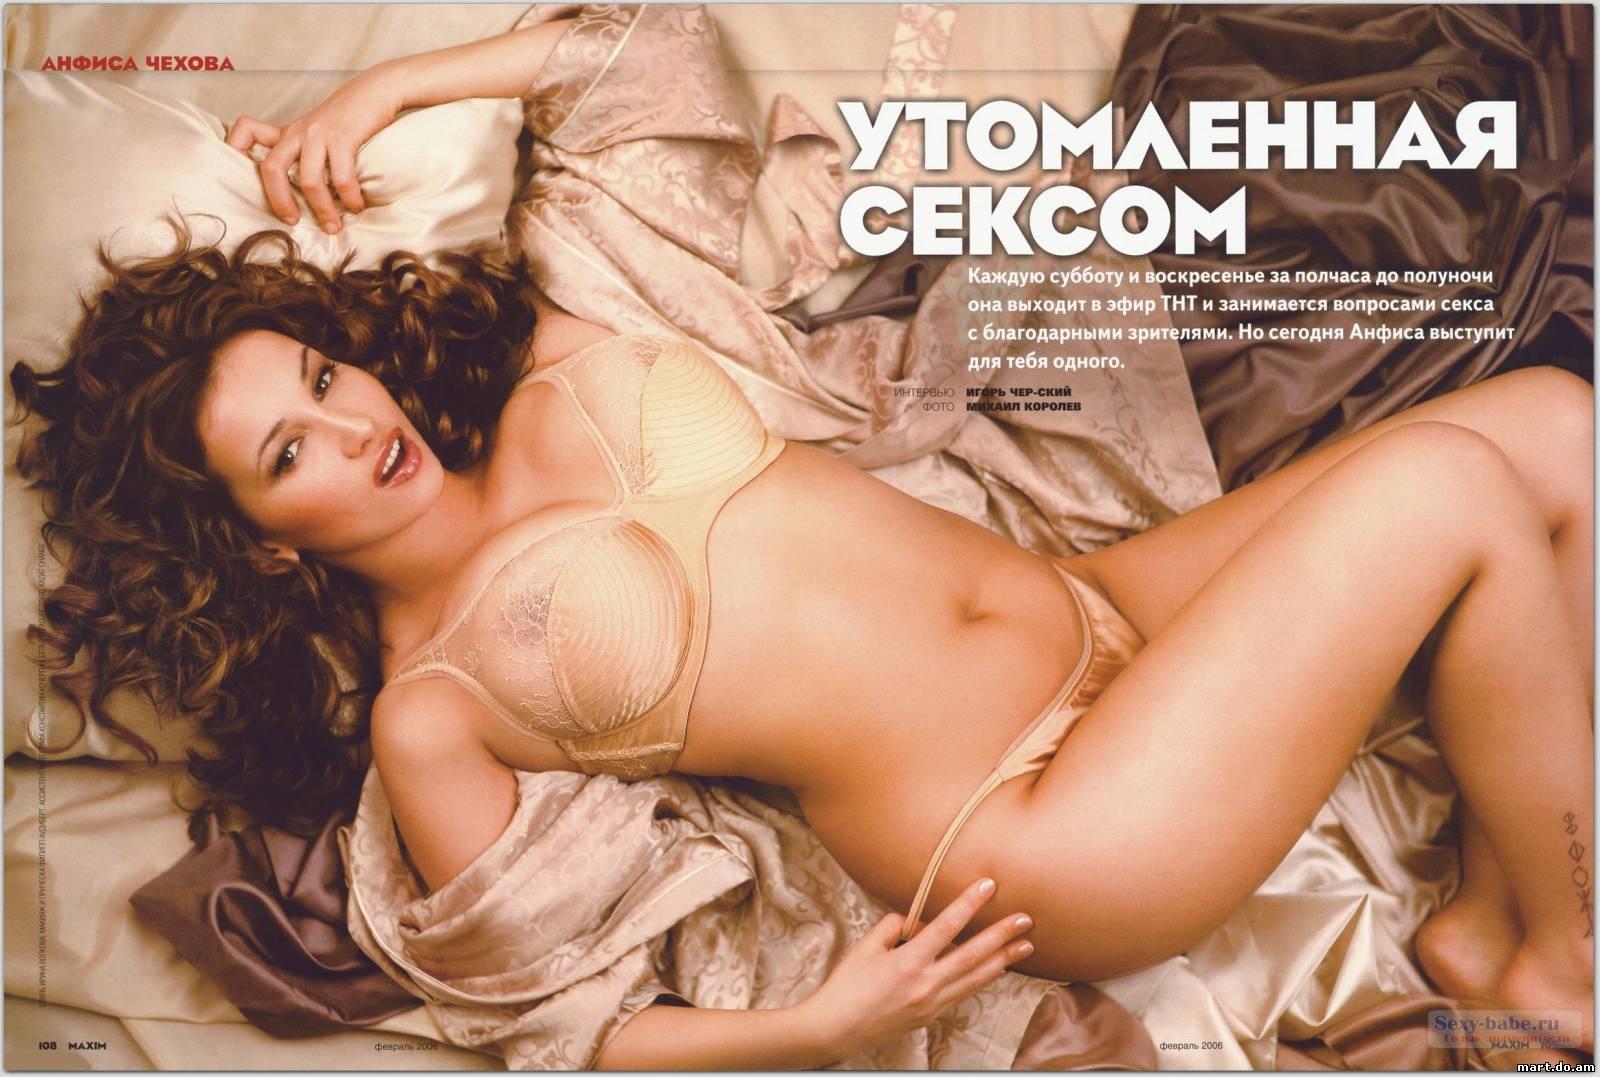 Секс с таджикскими артистами 29 фотография